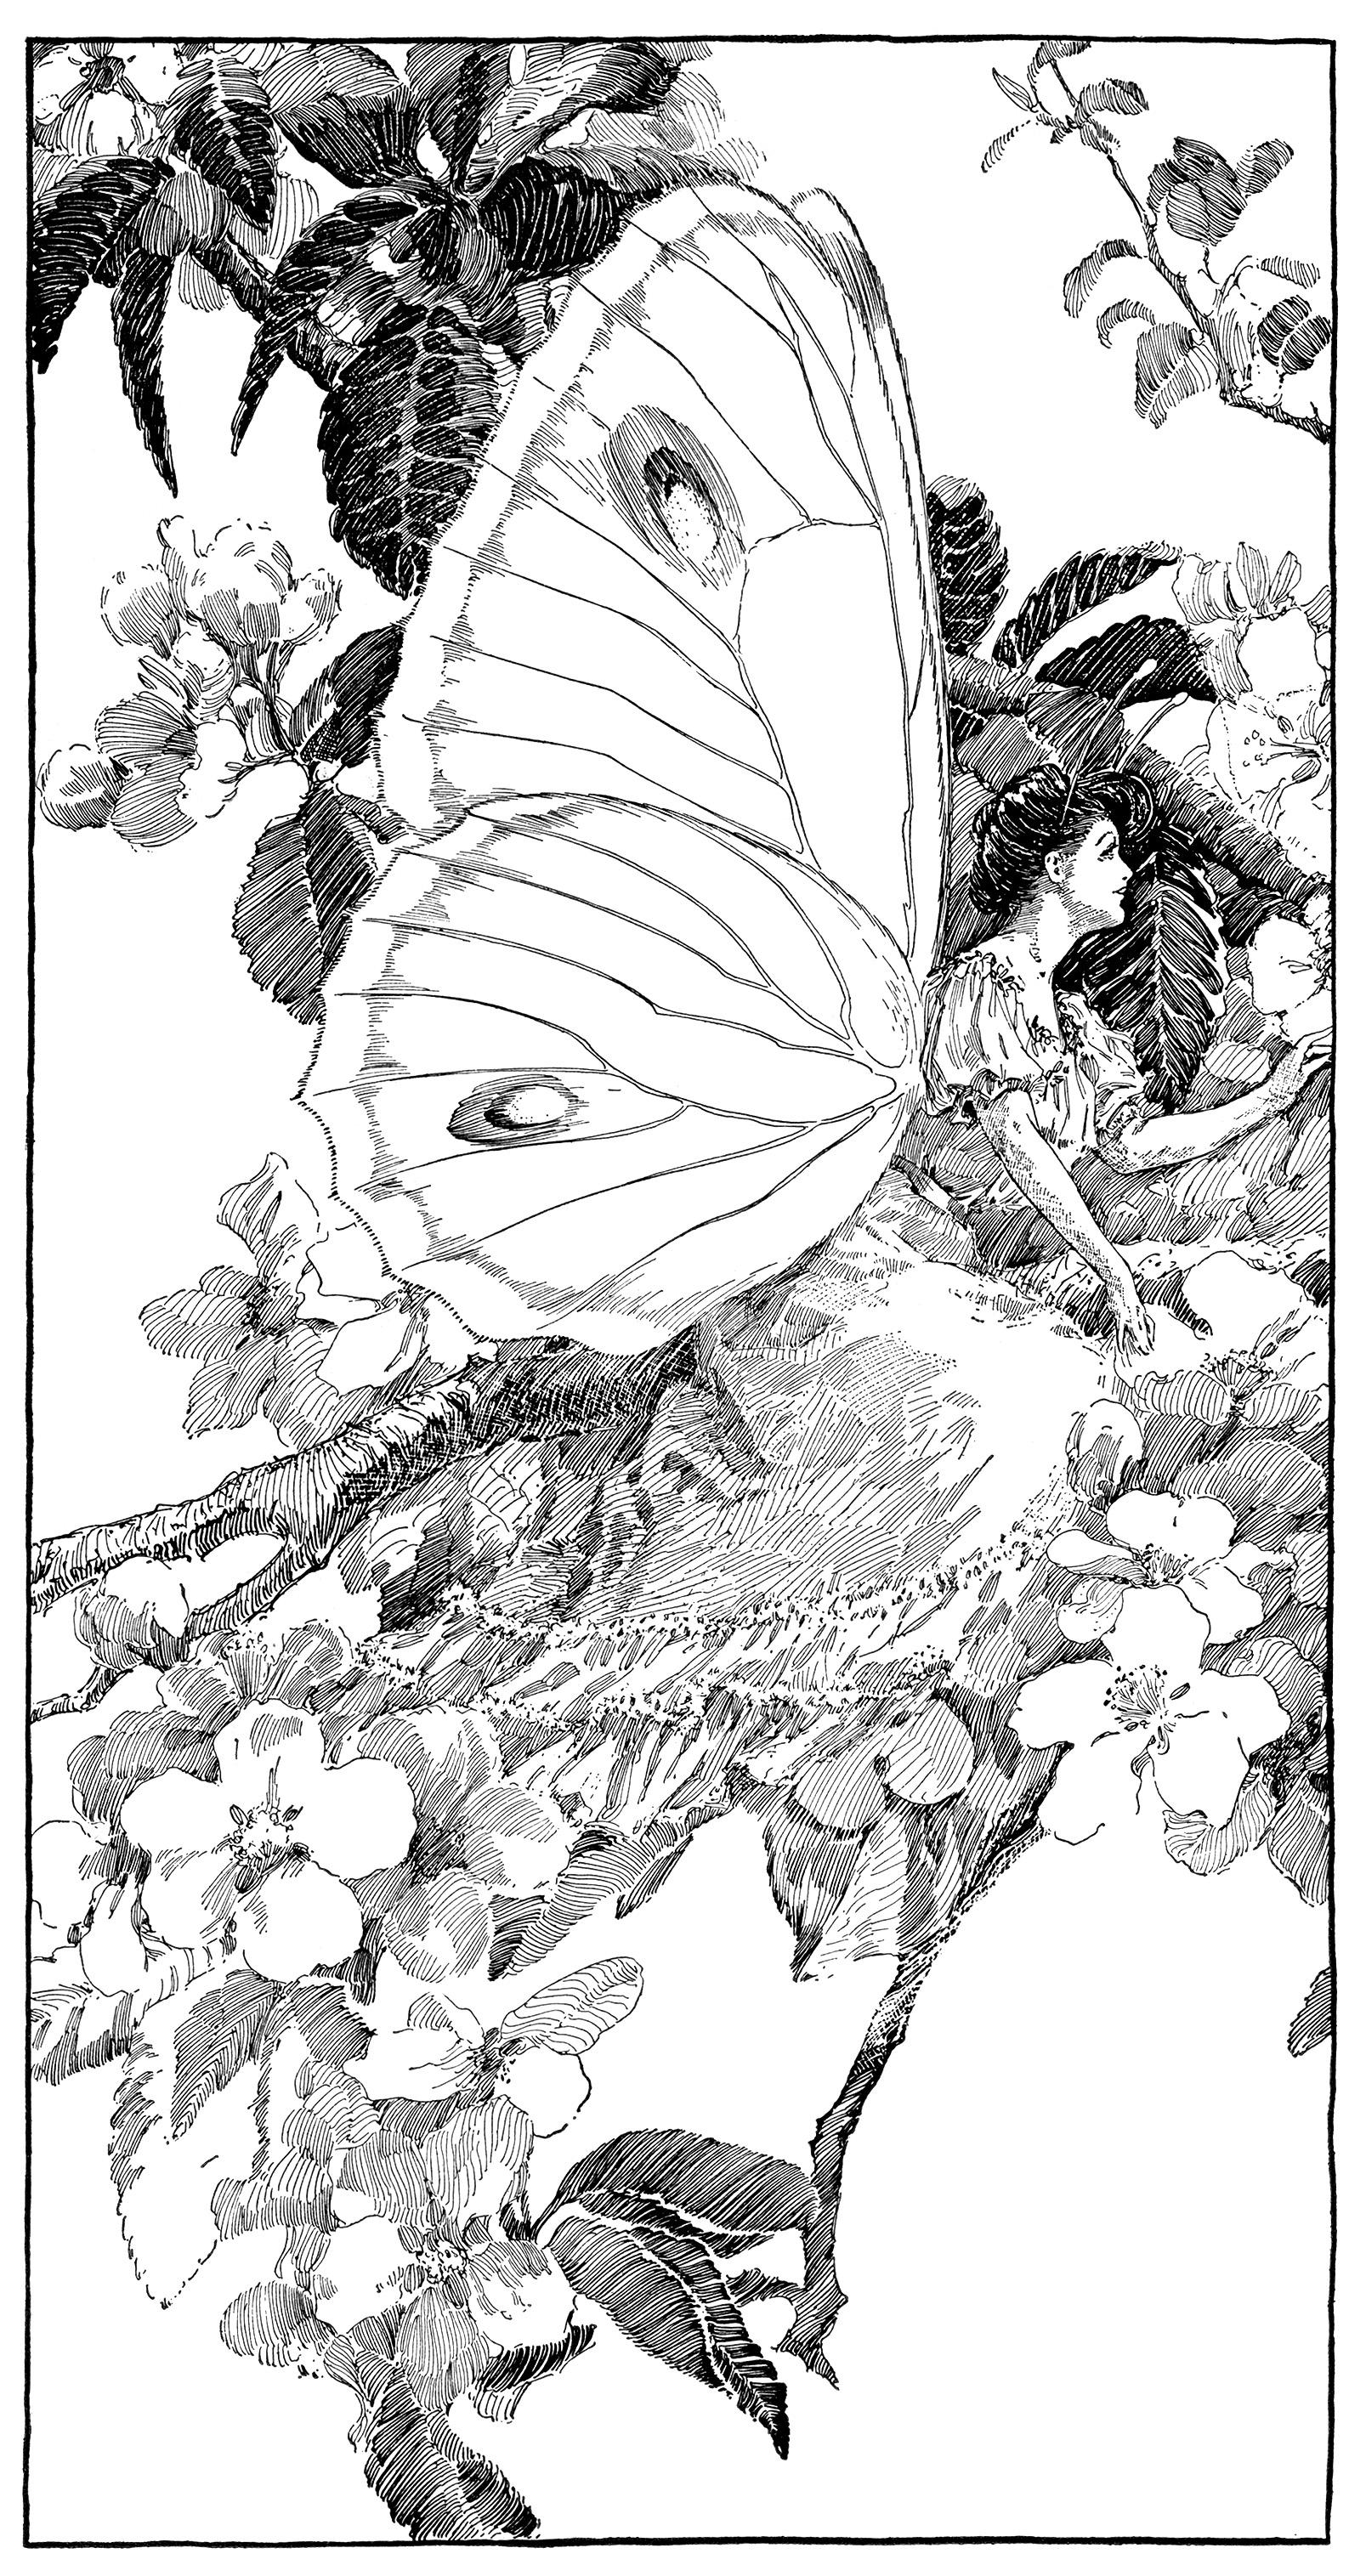 https://i0.wp.com/olddesignshop.com/wp-content/uploads/2013/07/OldDesignShop_ButterflyFairy1904.jpg